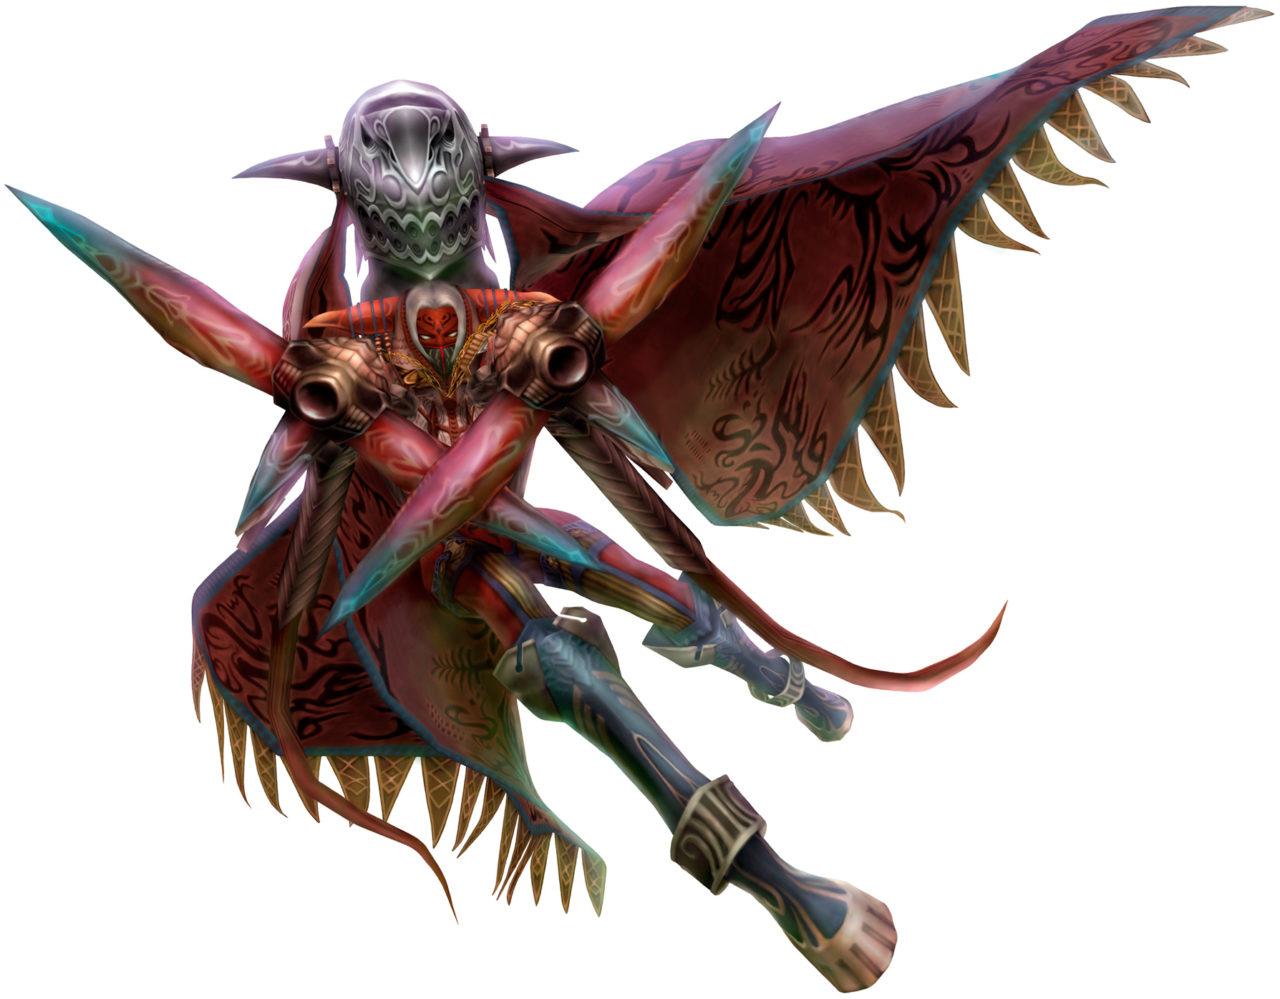 Final Fantasy XII FF12 TZA Shemhazai The Whisperer